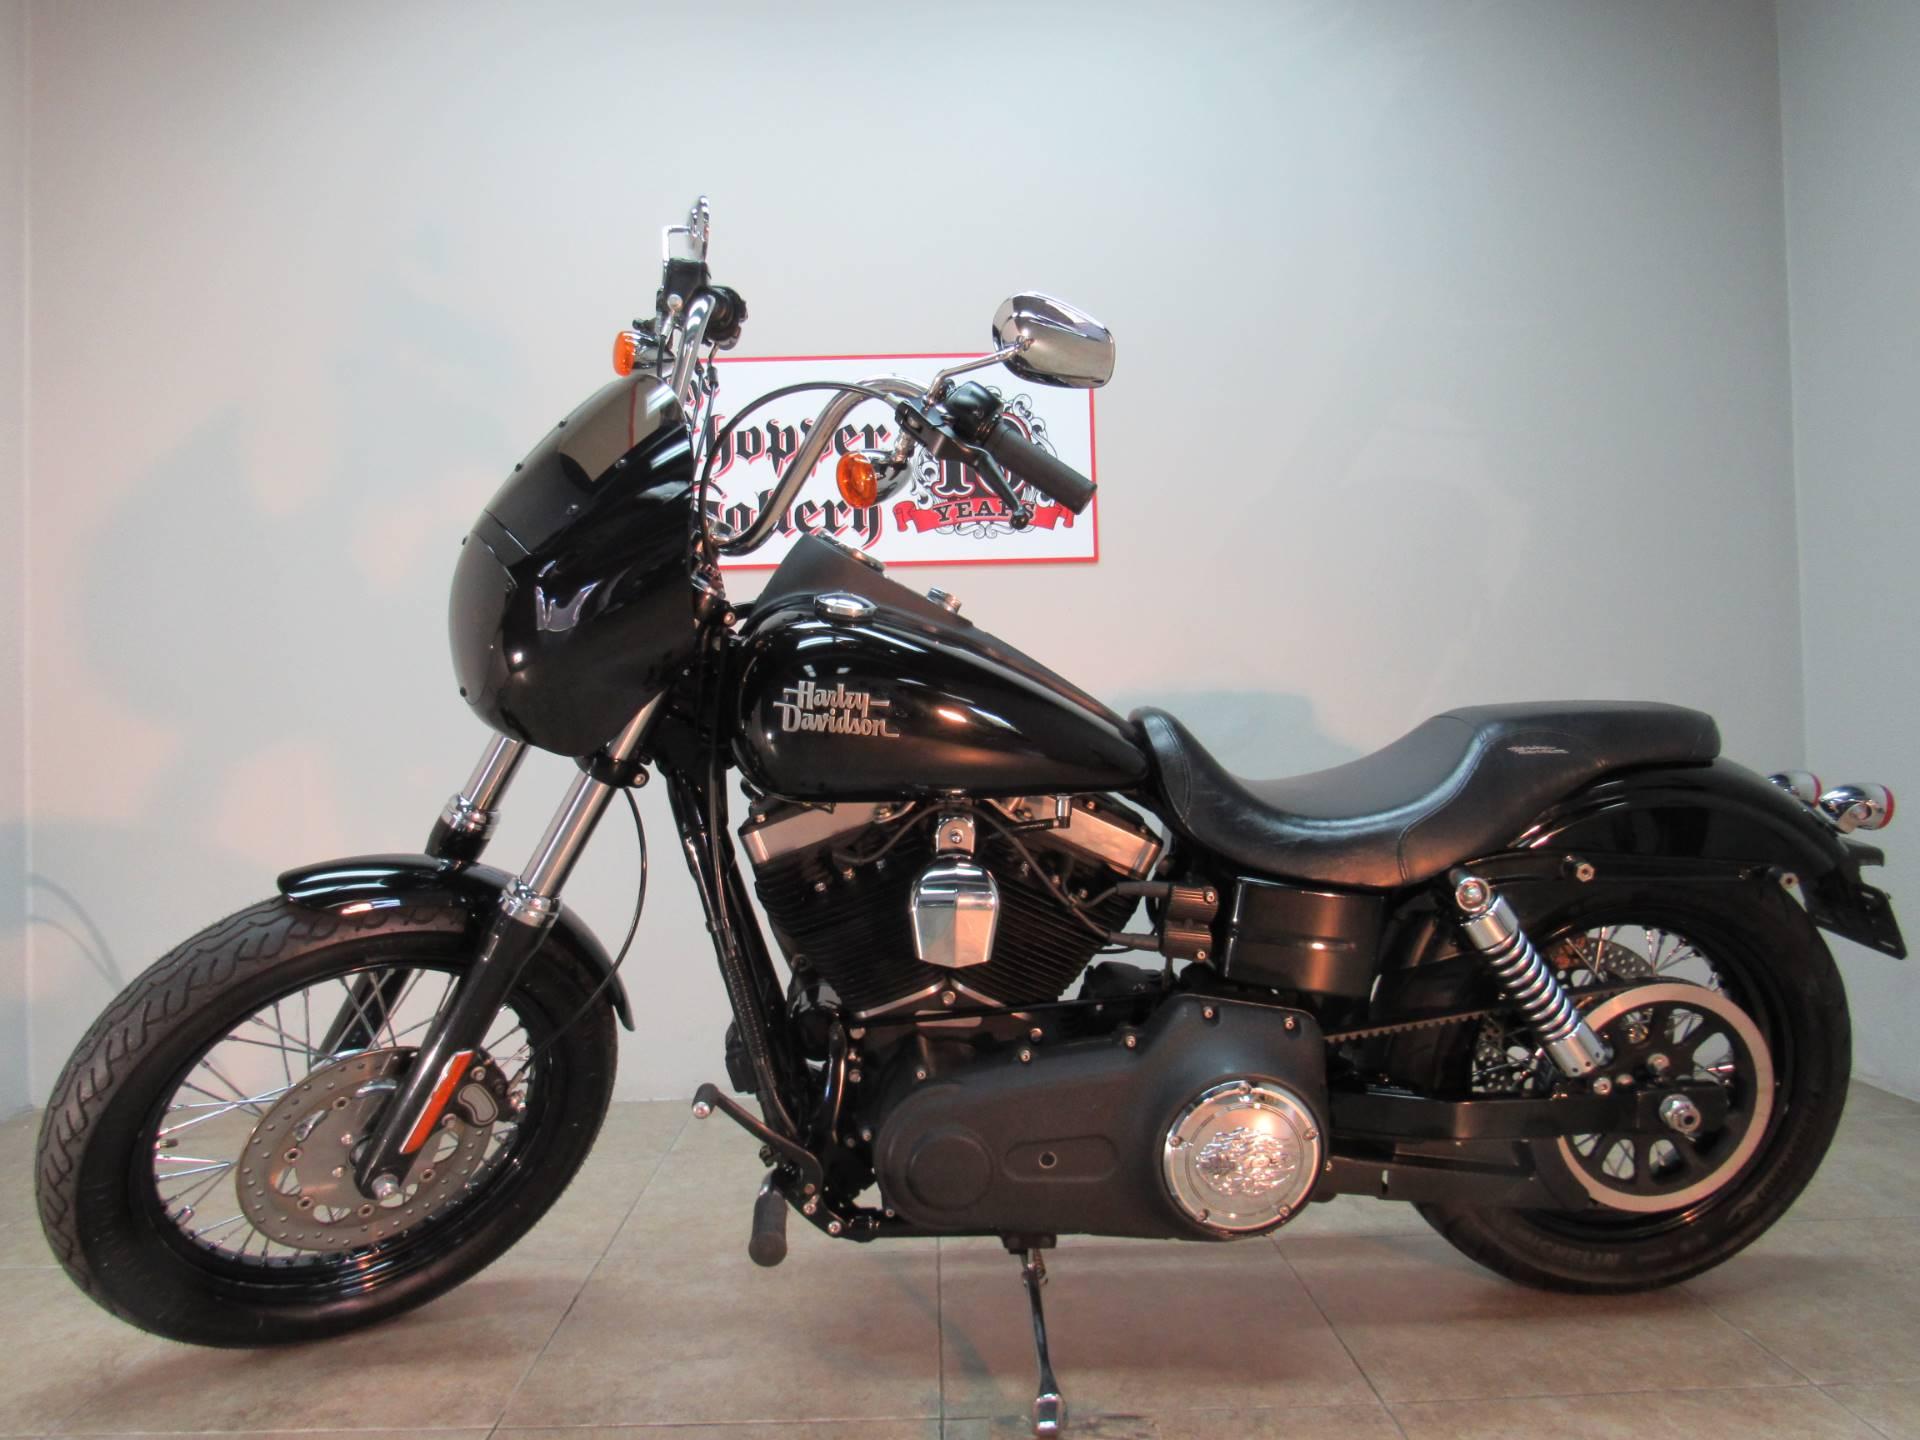 used 2015 harley davidson street bob motorcycles in temecula ca